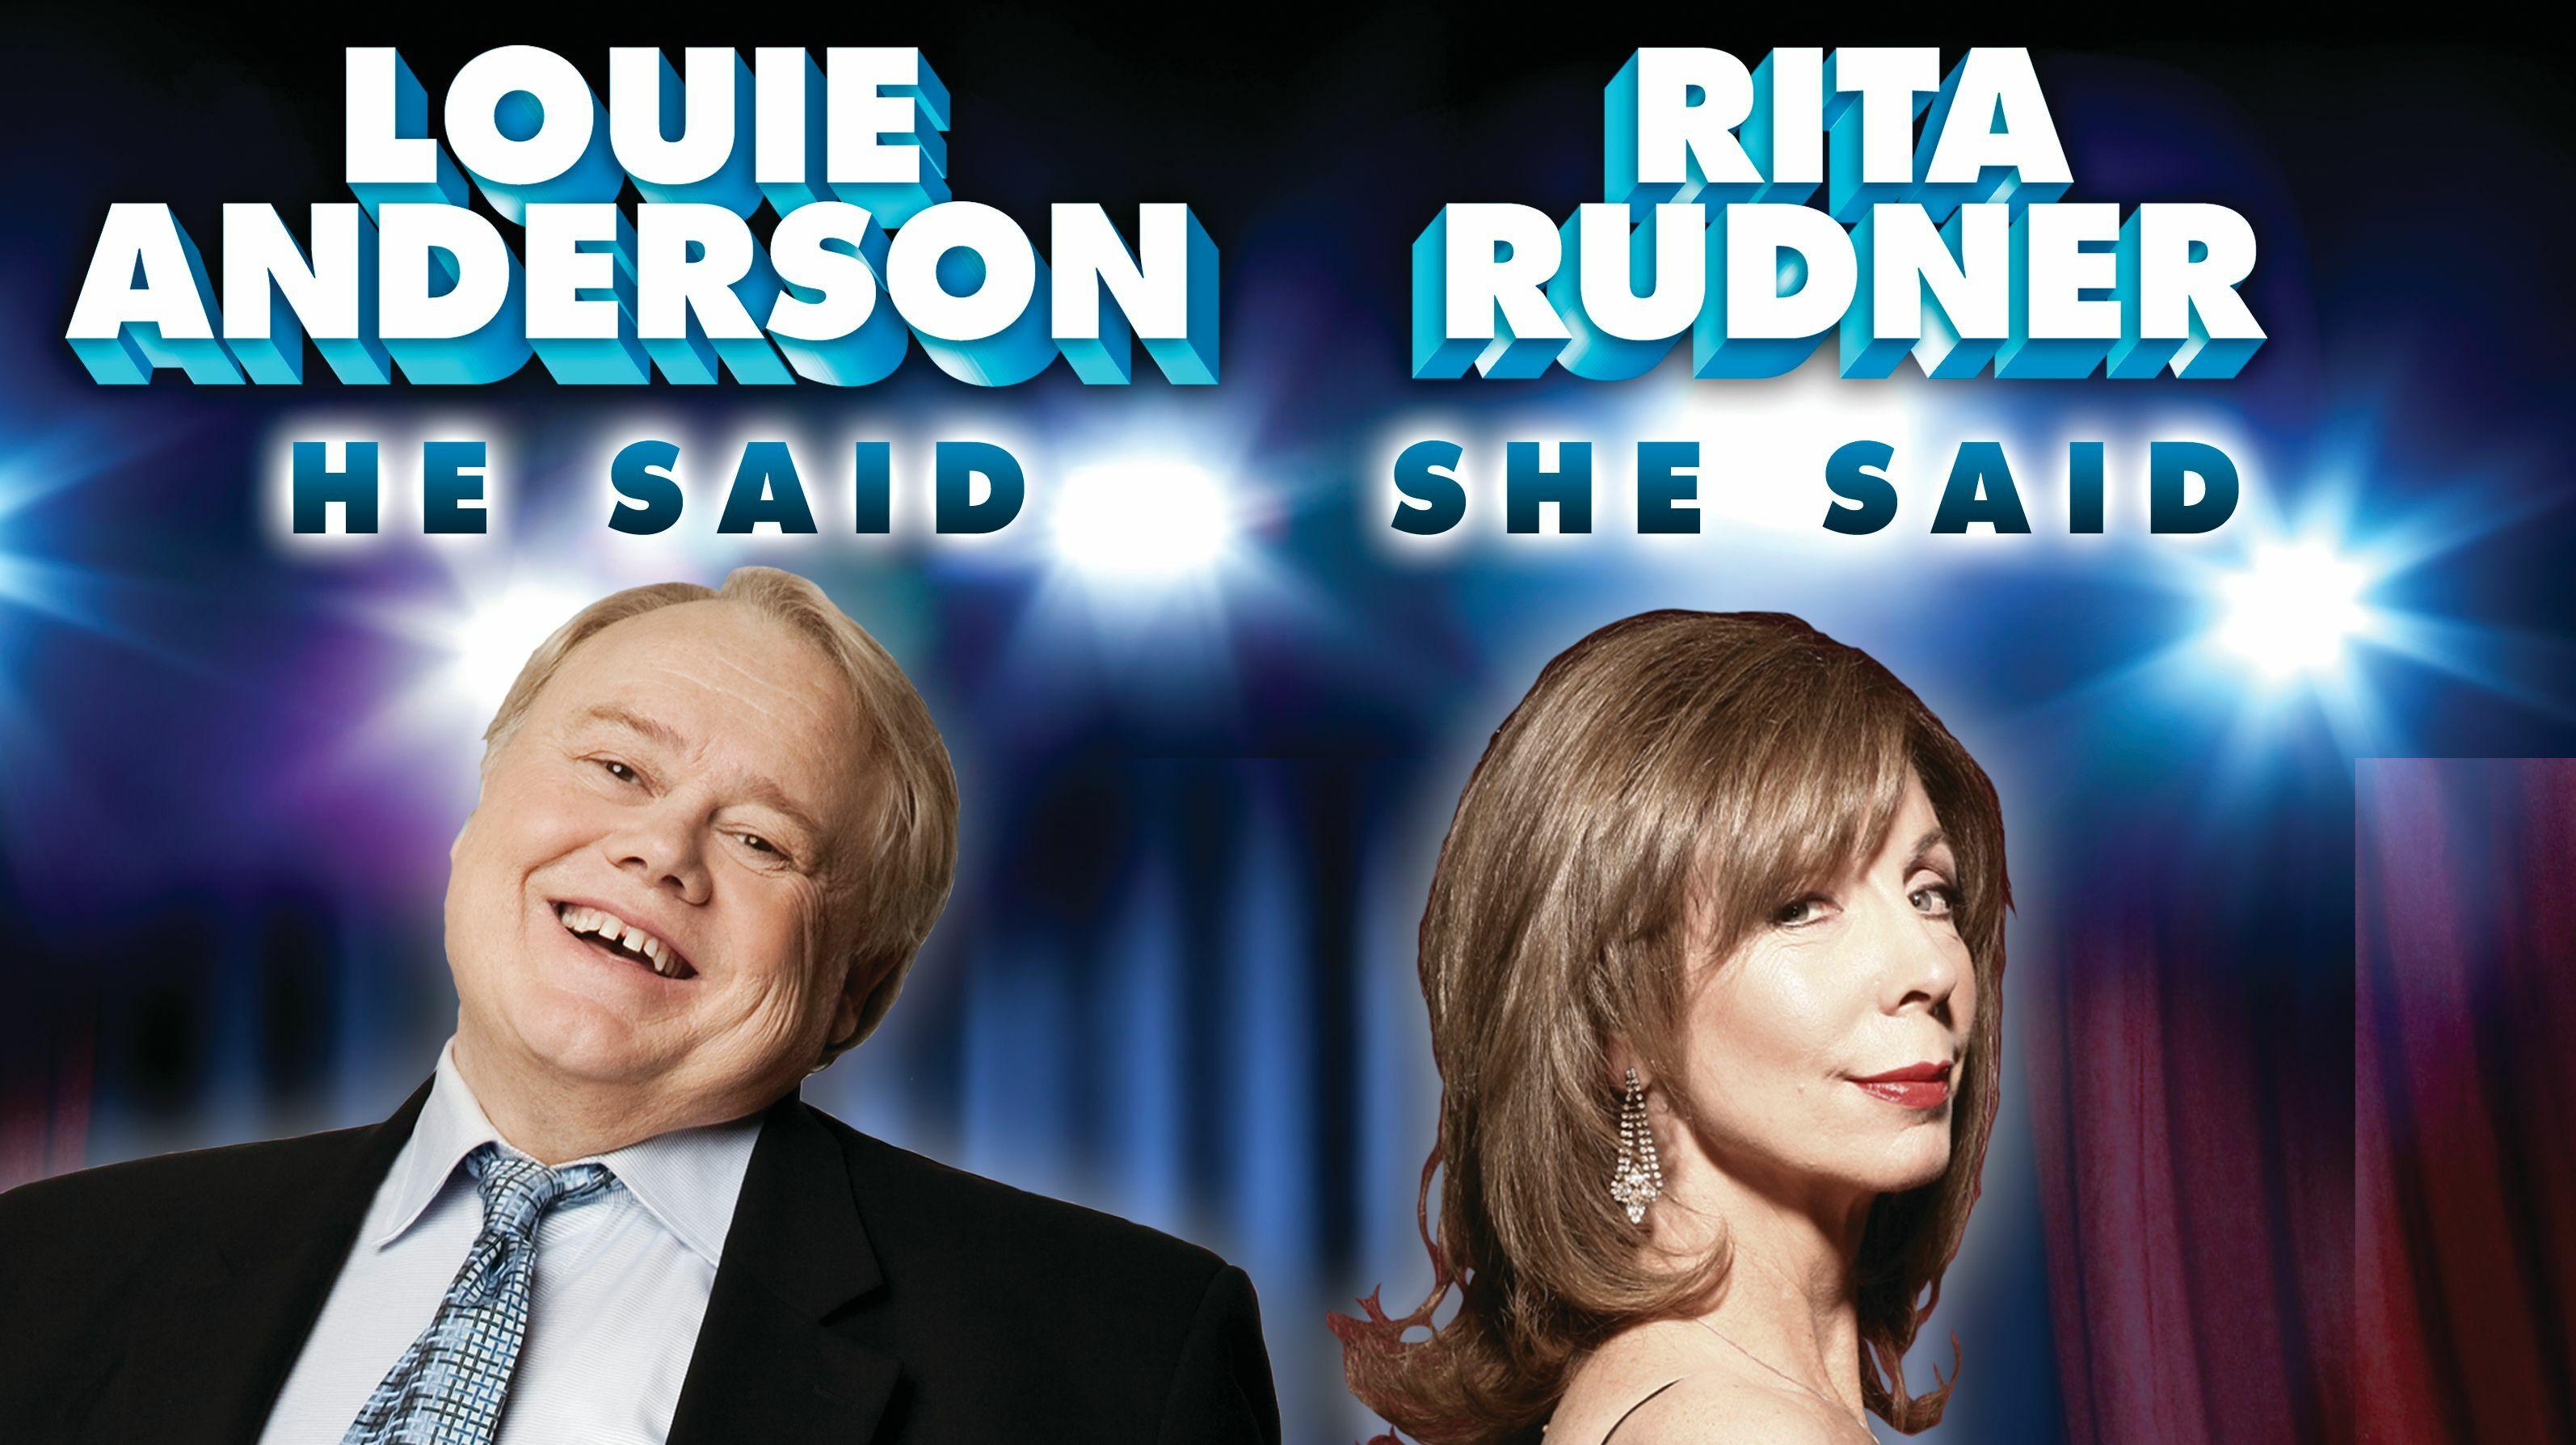 Louie Anderson and Rita Rudner